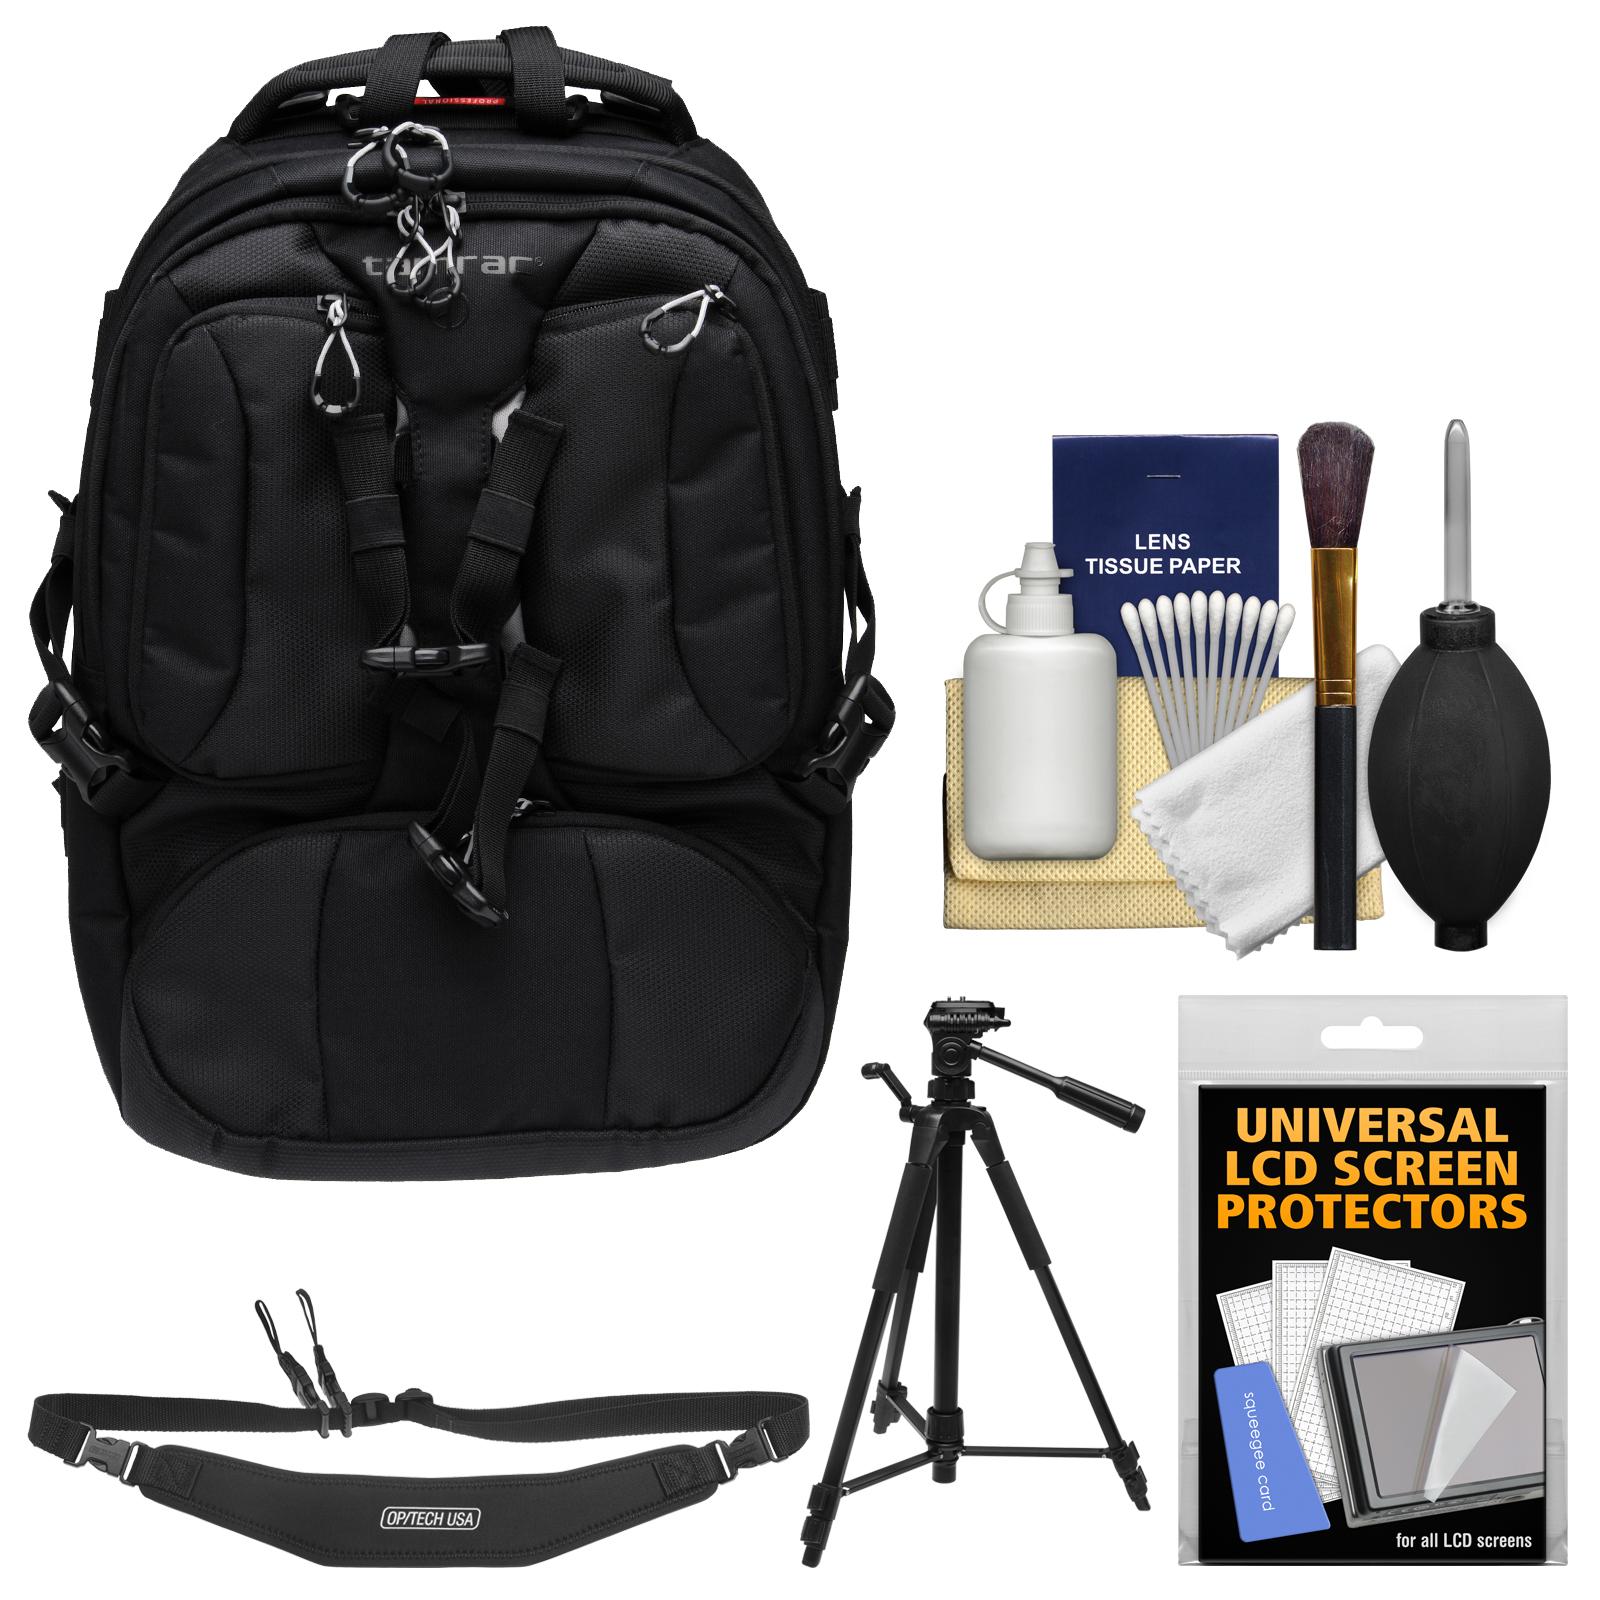 Tamrac T0210 Anvil Slim 11 Photo DSLR Camera   Laptop Backpack with Tripod + Sling Strap + Kit by Tamrac